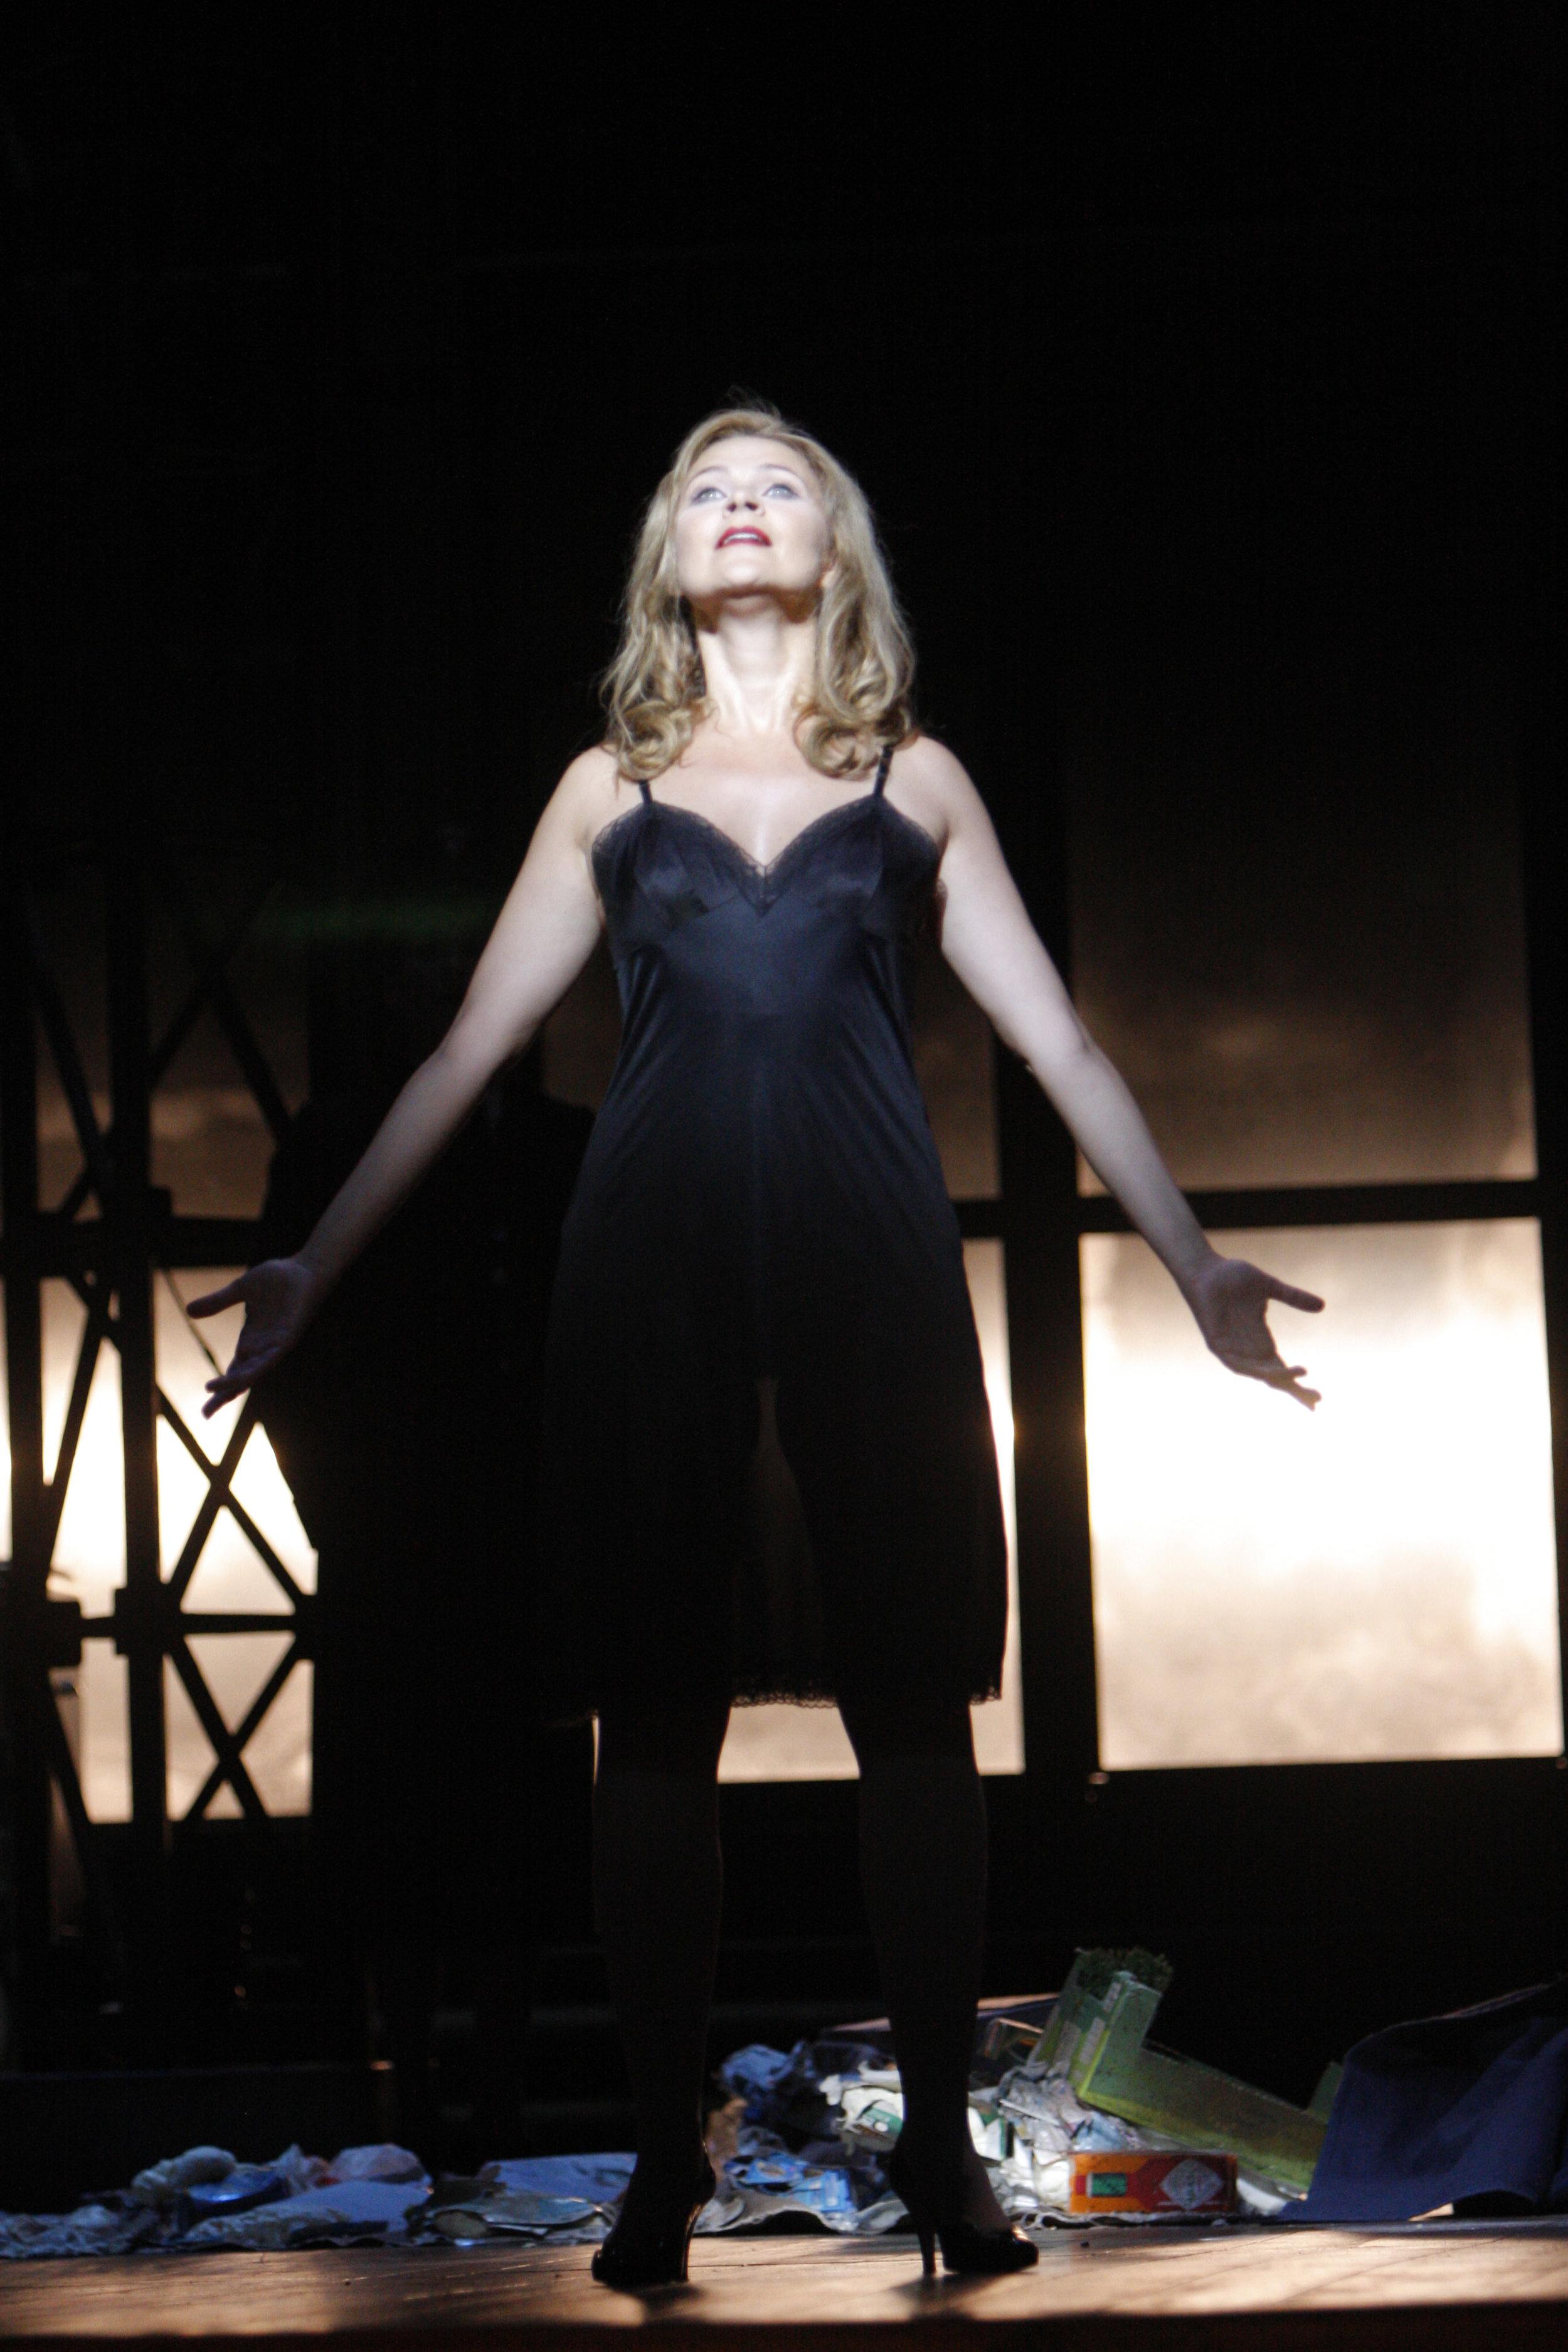 Ruxandra Donose as Veronica Quaife in The Fly. 图片来源: Robert Millard, 美国洛杉矶歌剧院, 2008